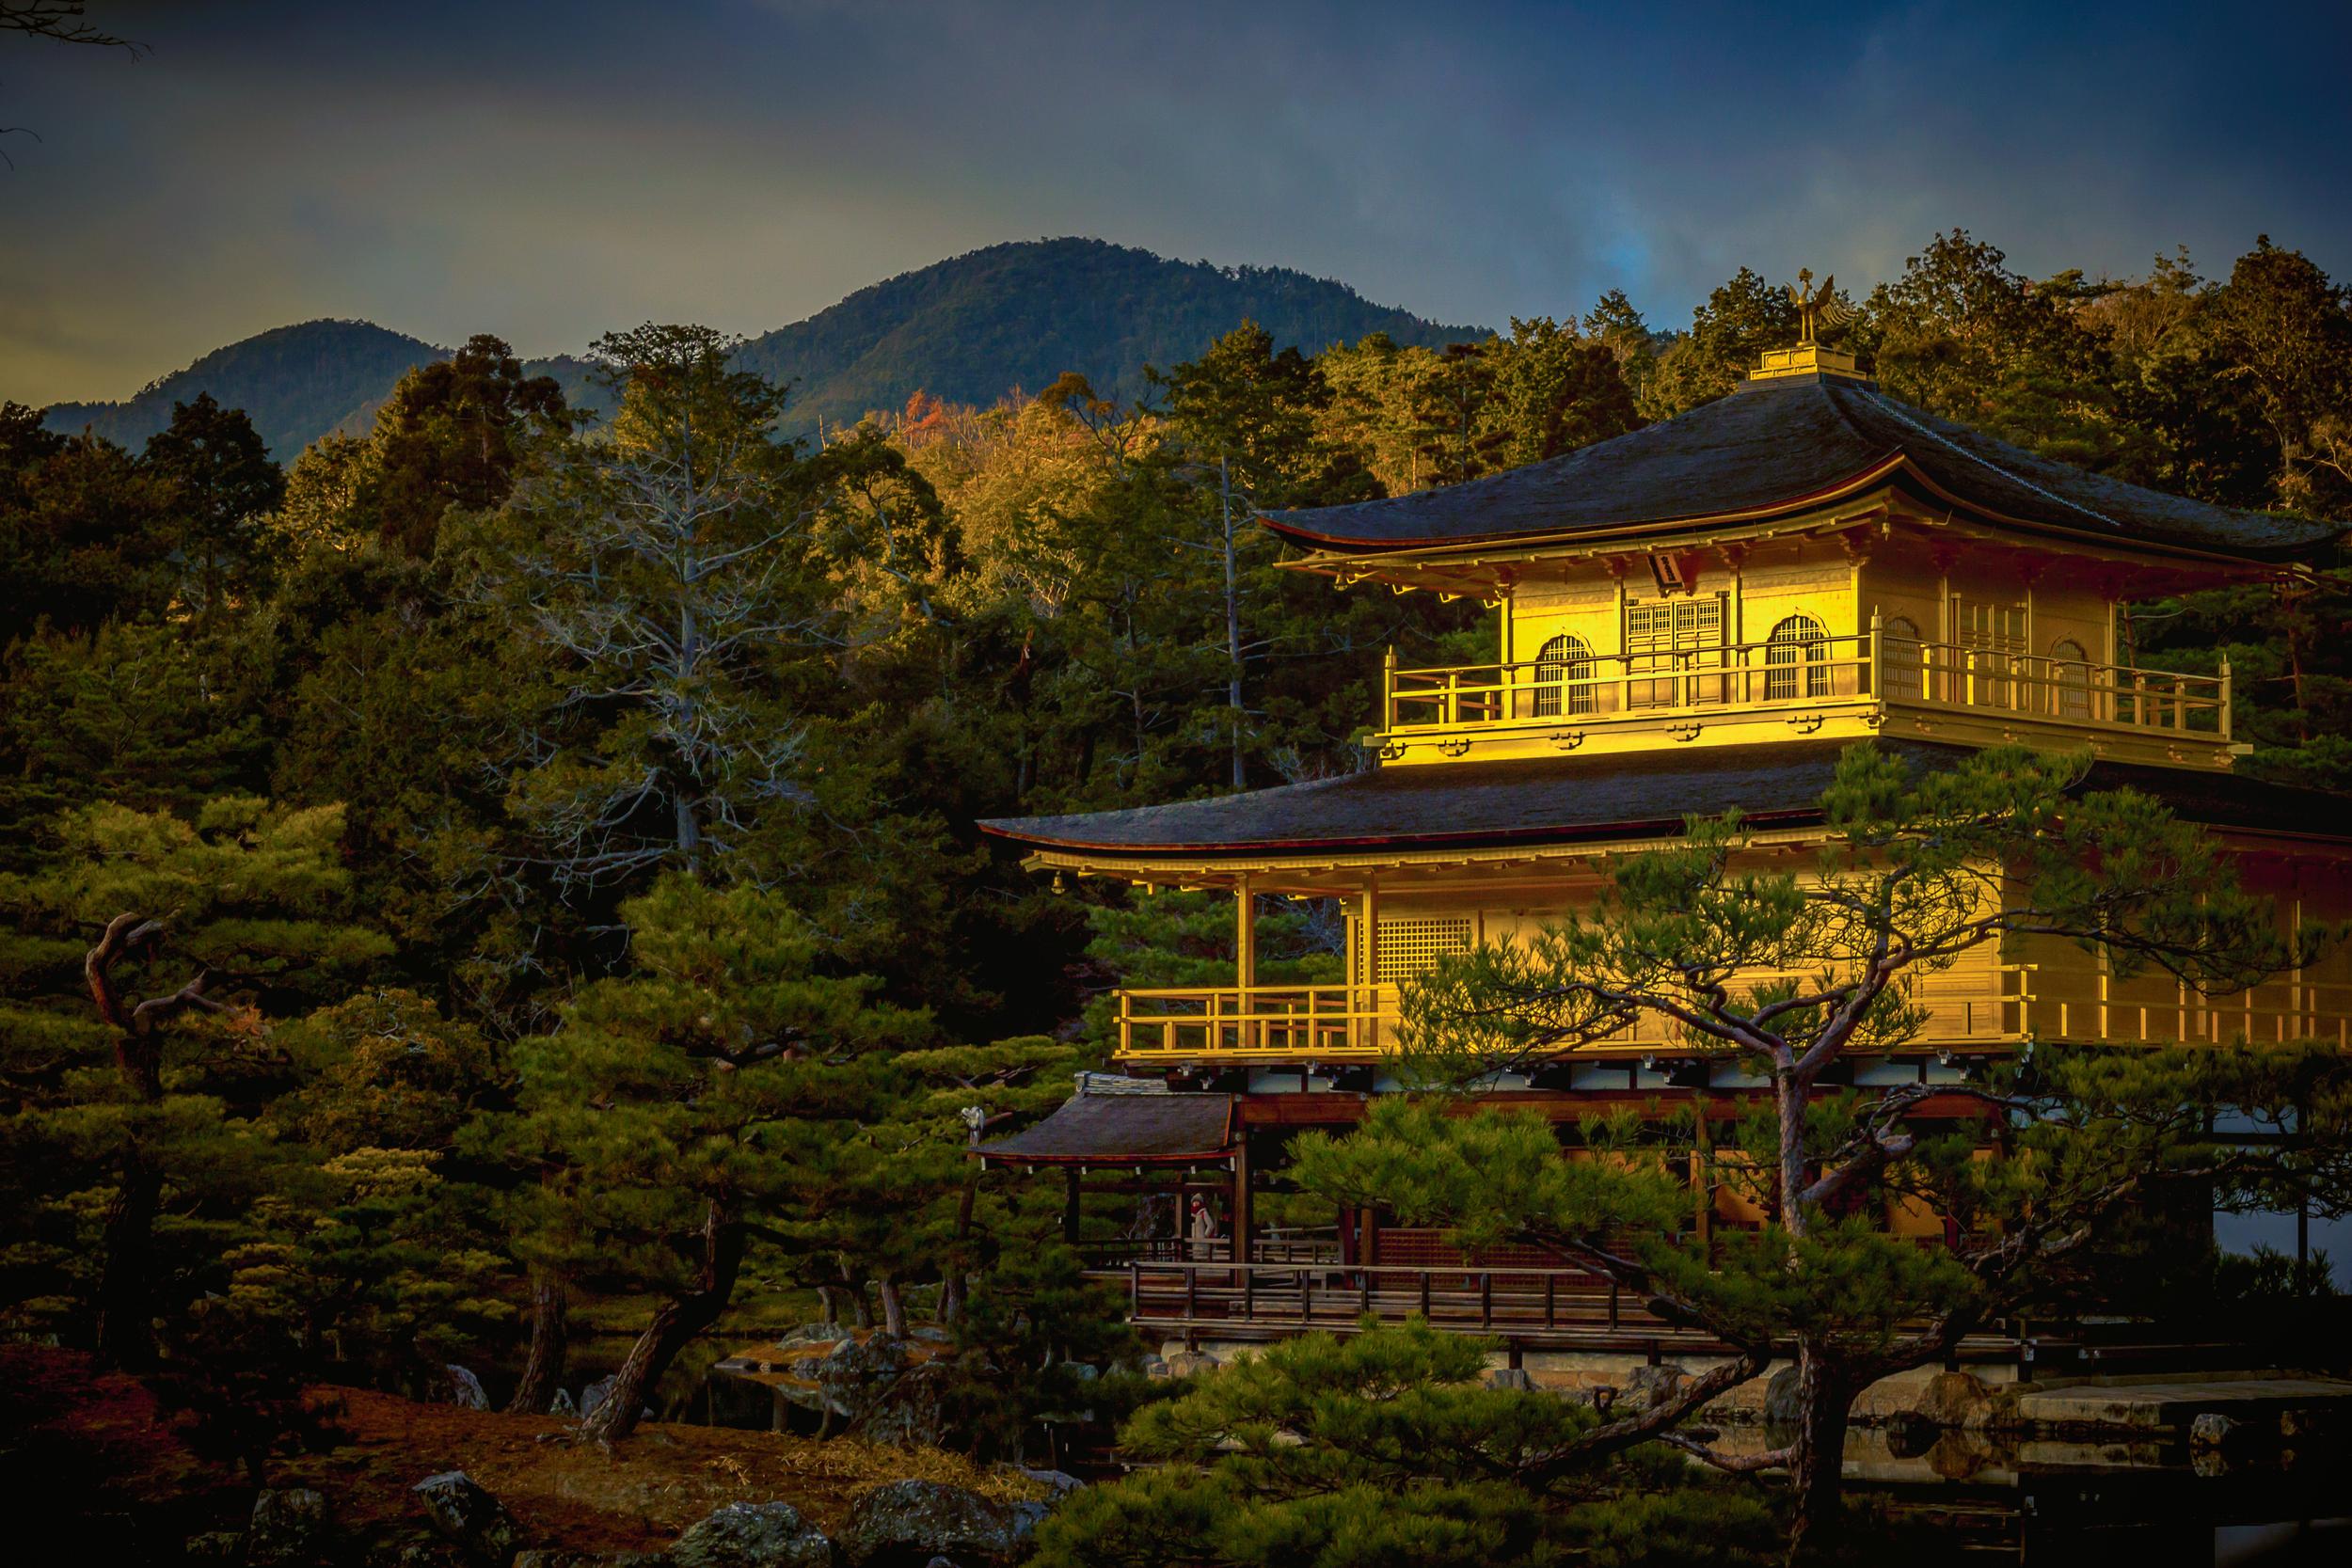 Kyoto Travel Guide - Eric Bravo Photography